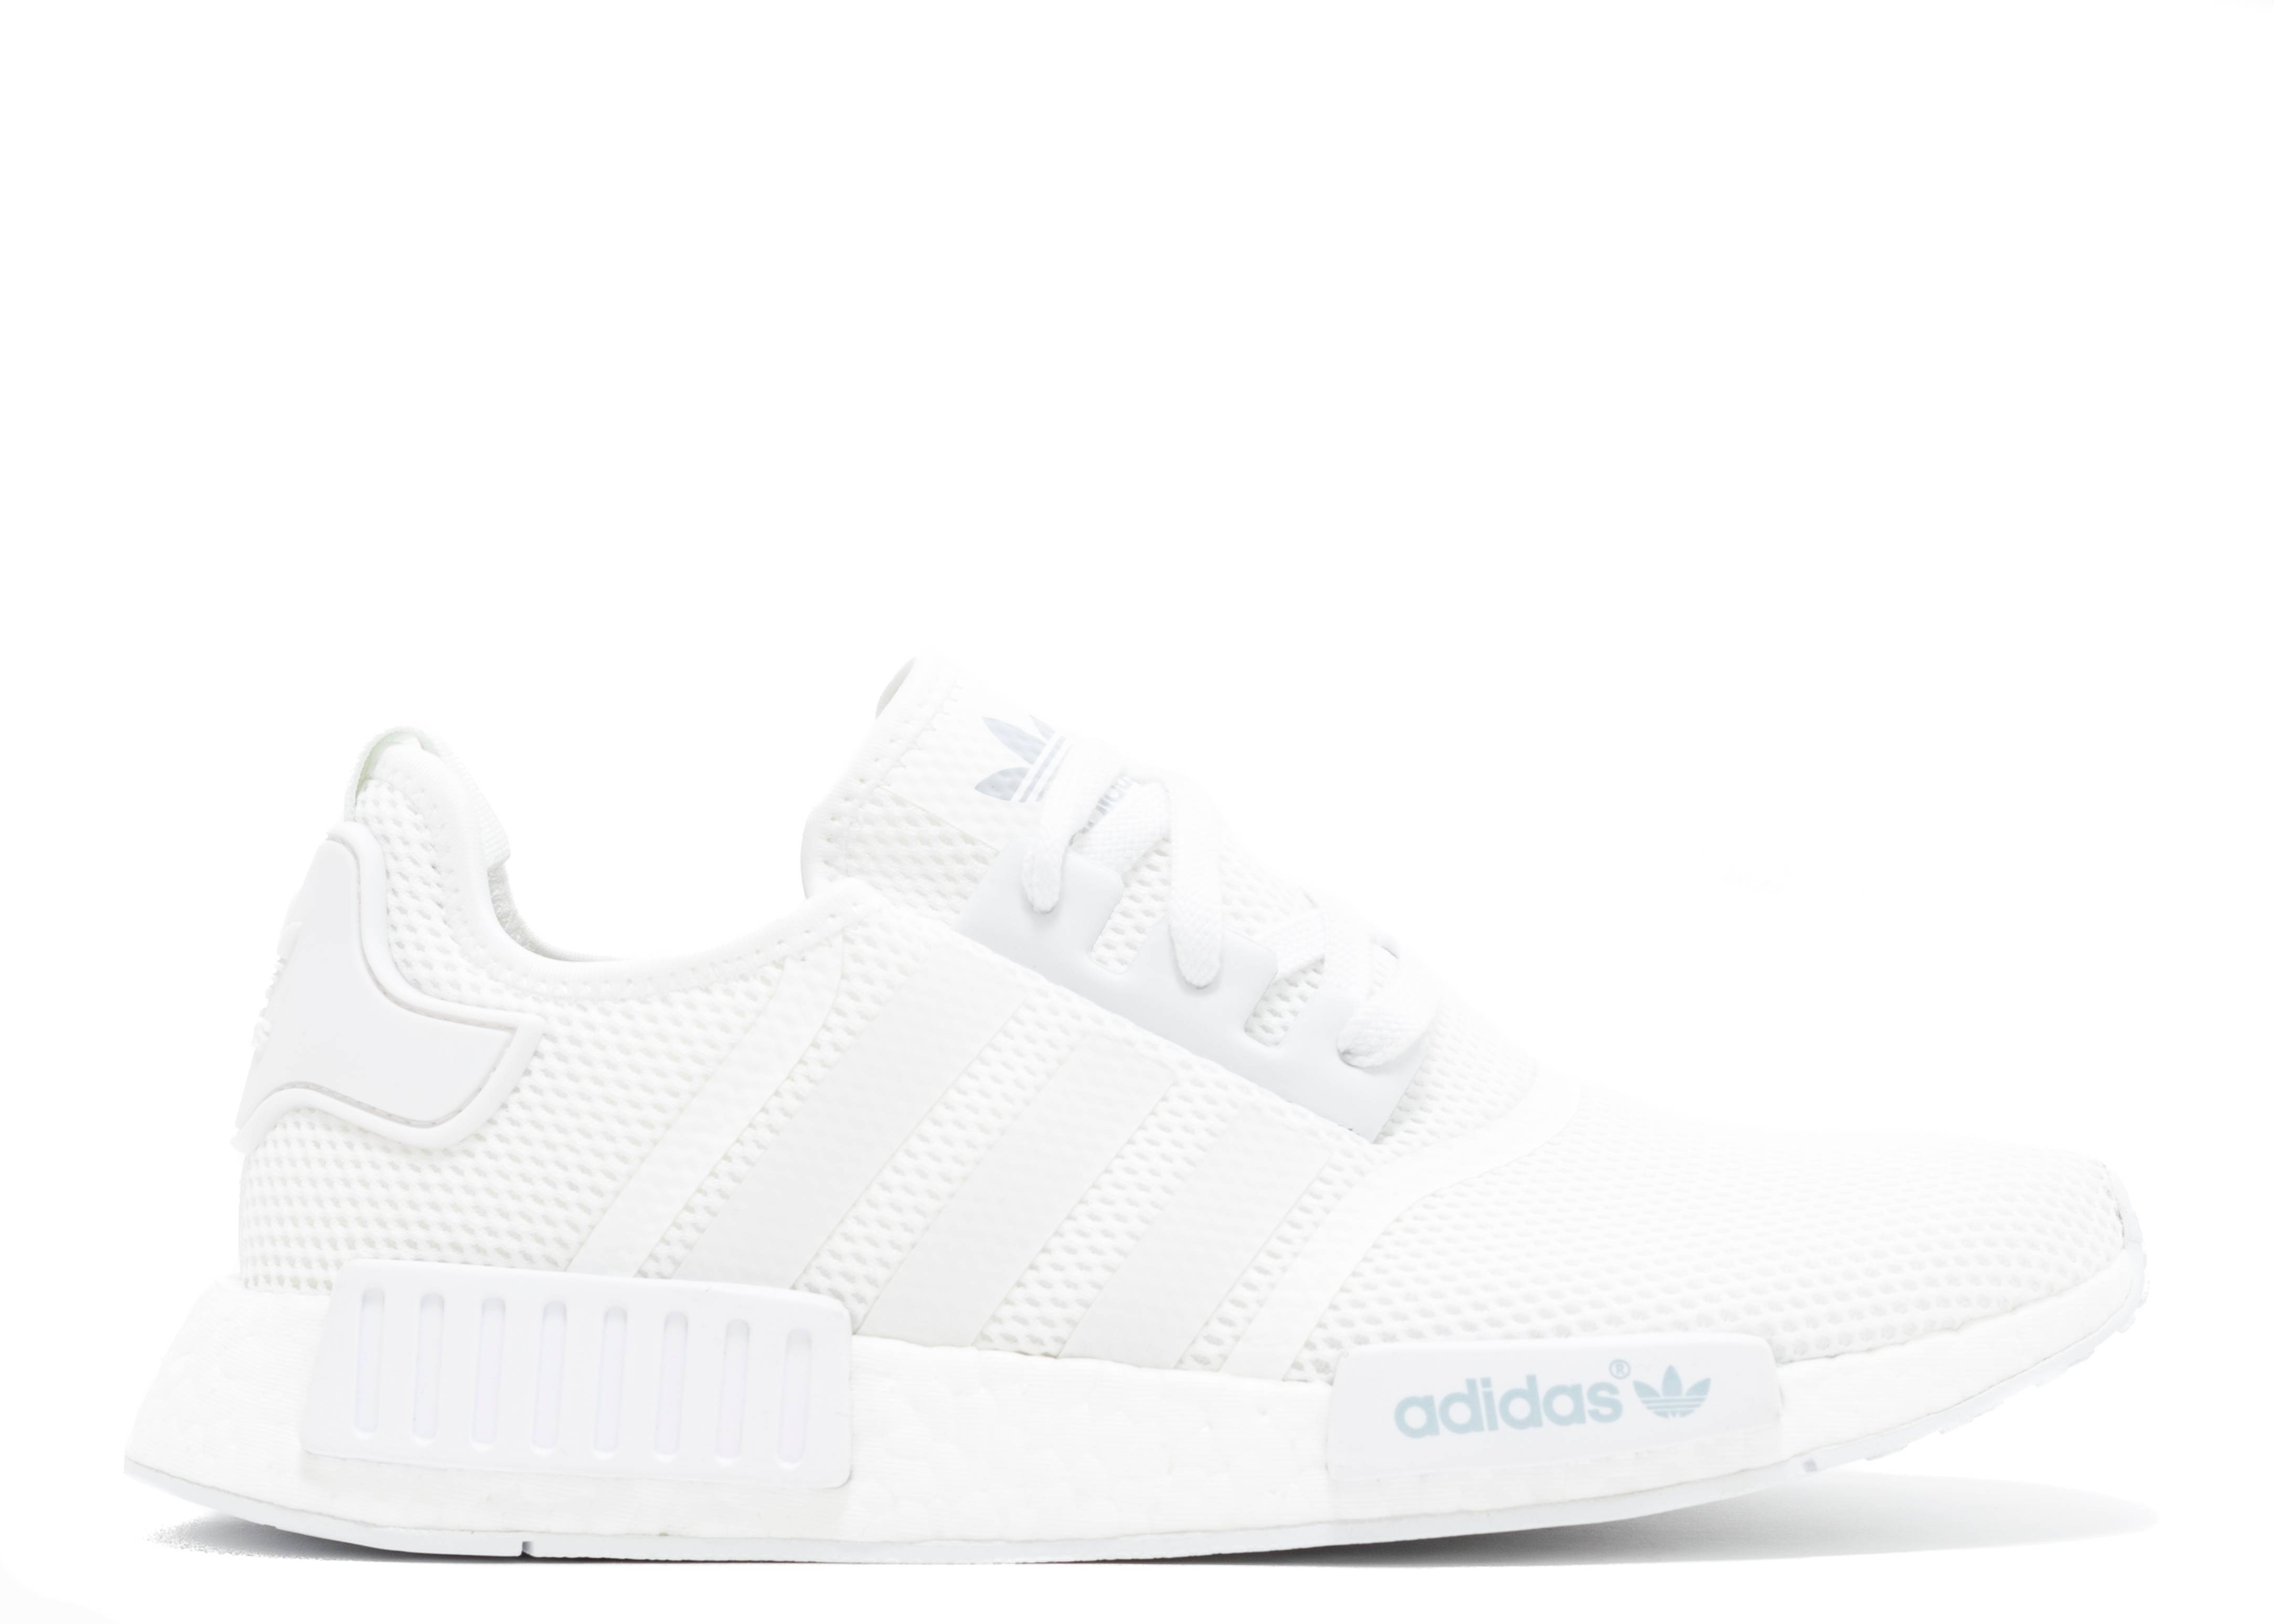 Adidas NMD R1 Primeknit